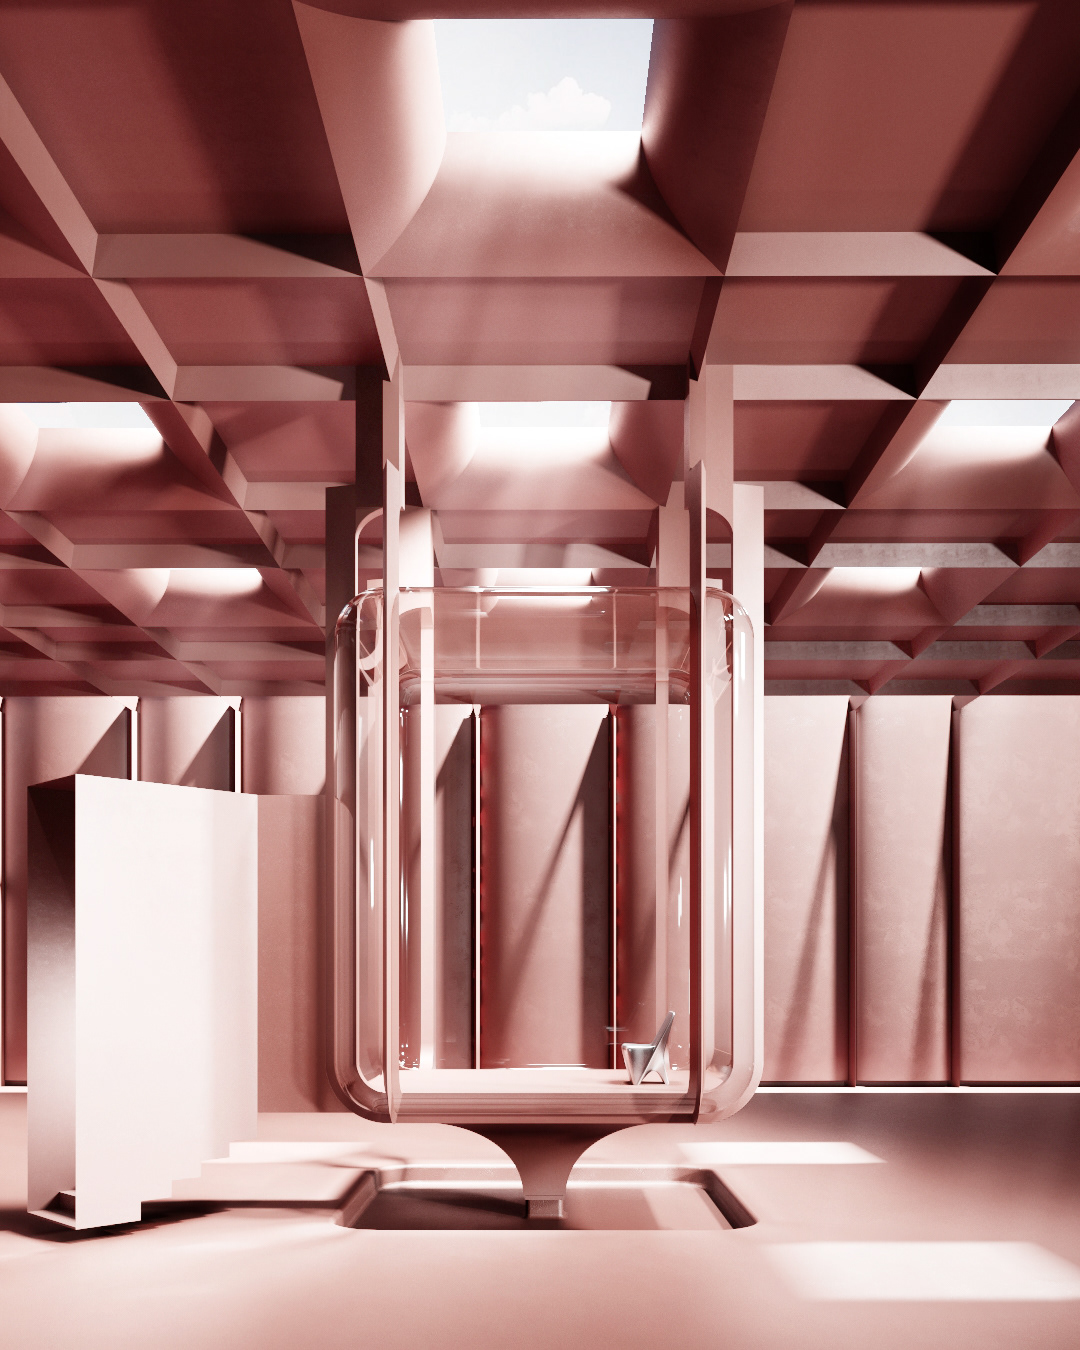 3dart CGI chair design dreamy Interior pink product surreal visualisation